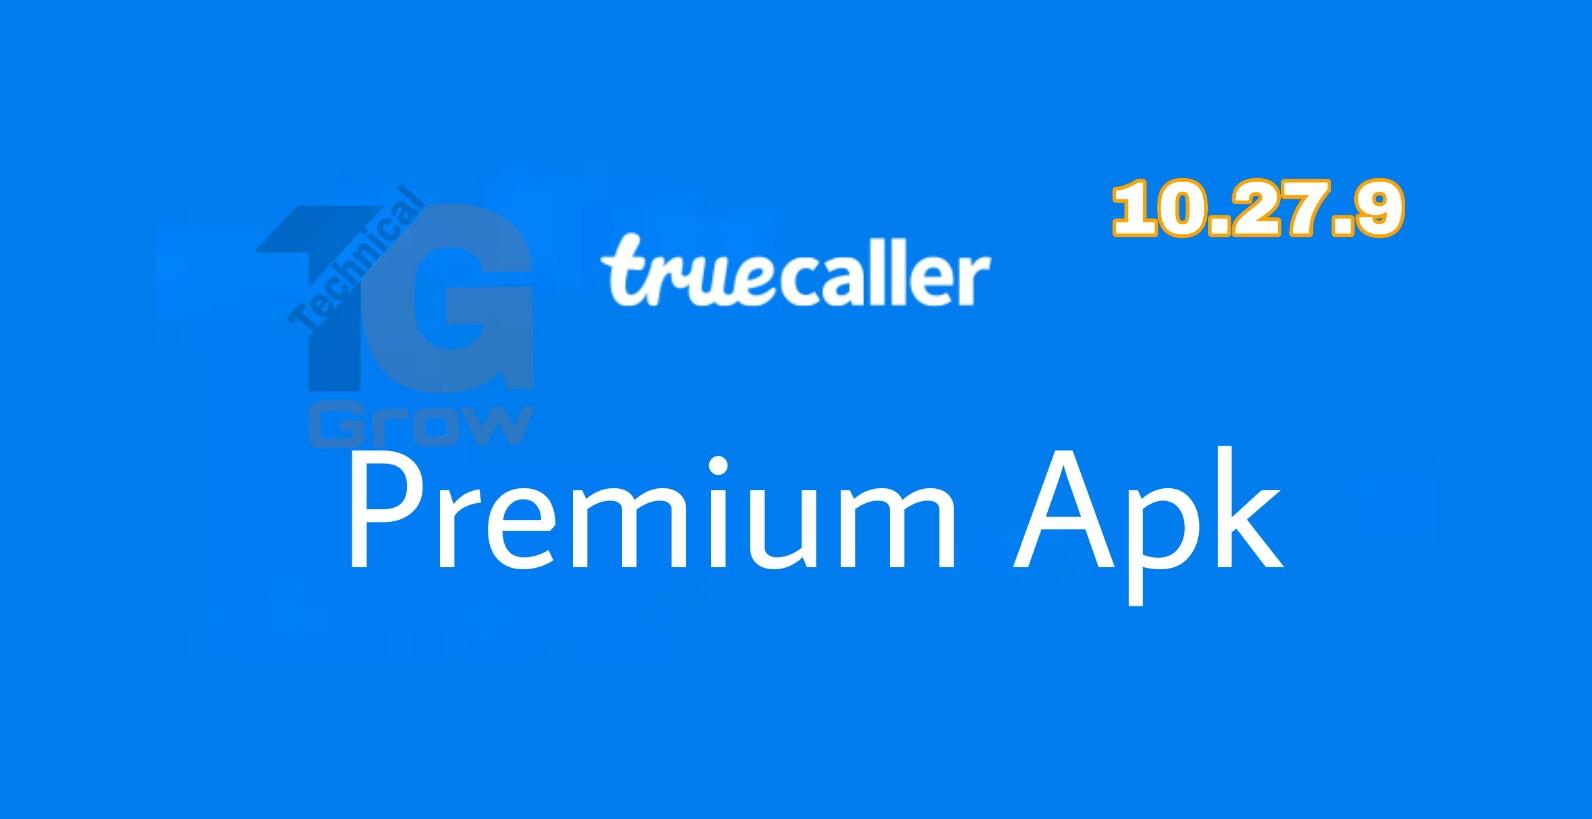 TrueCaller Premium Apk | Free | 10.27.9 | Technical Grow, true caller premium apk, true caller hack.